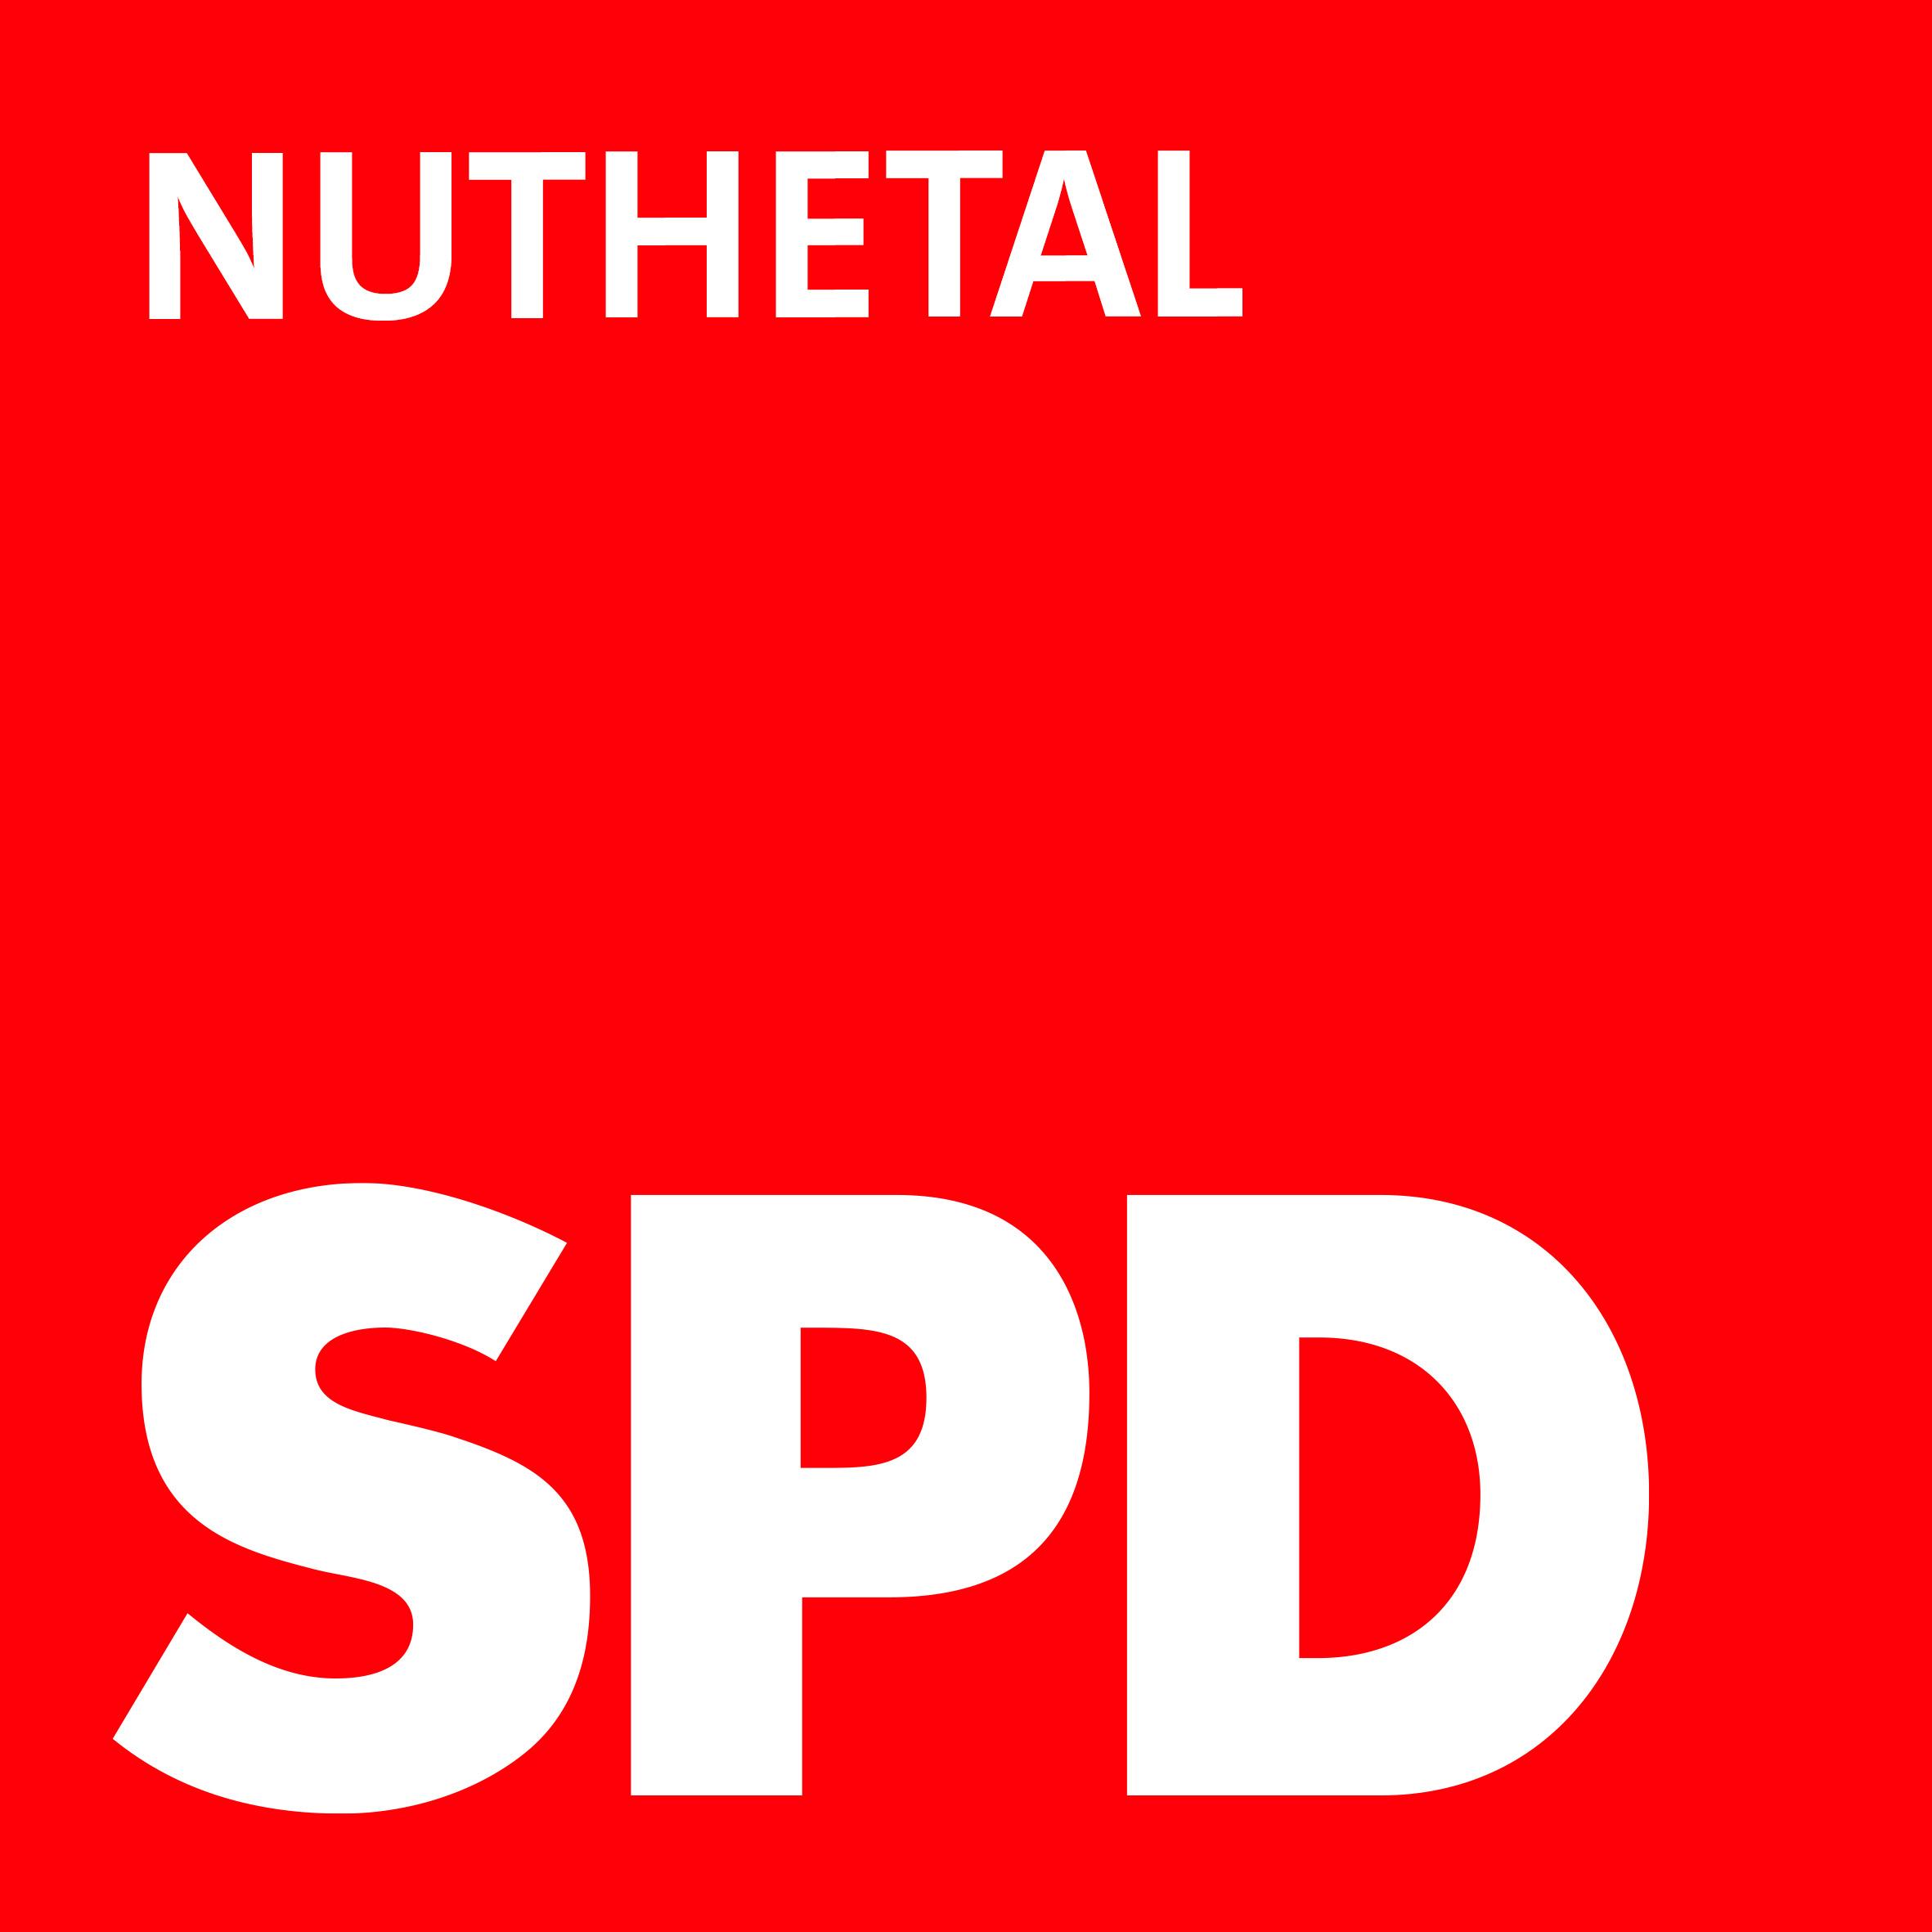 SPD Nuthetal